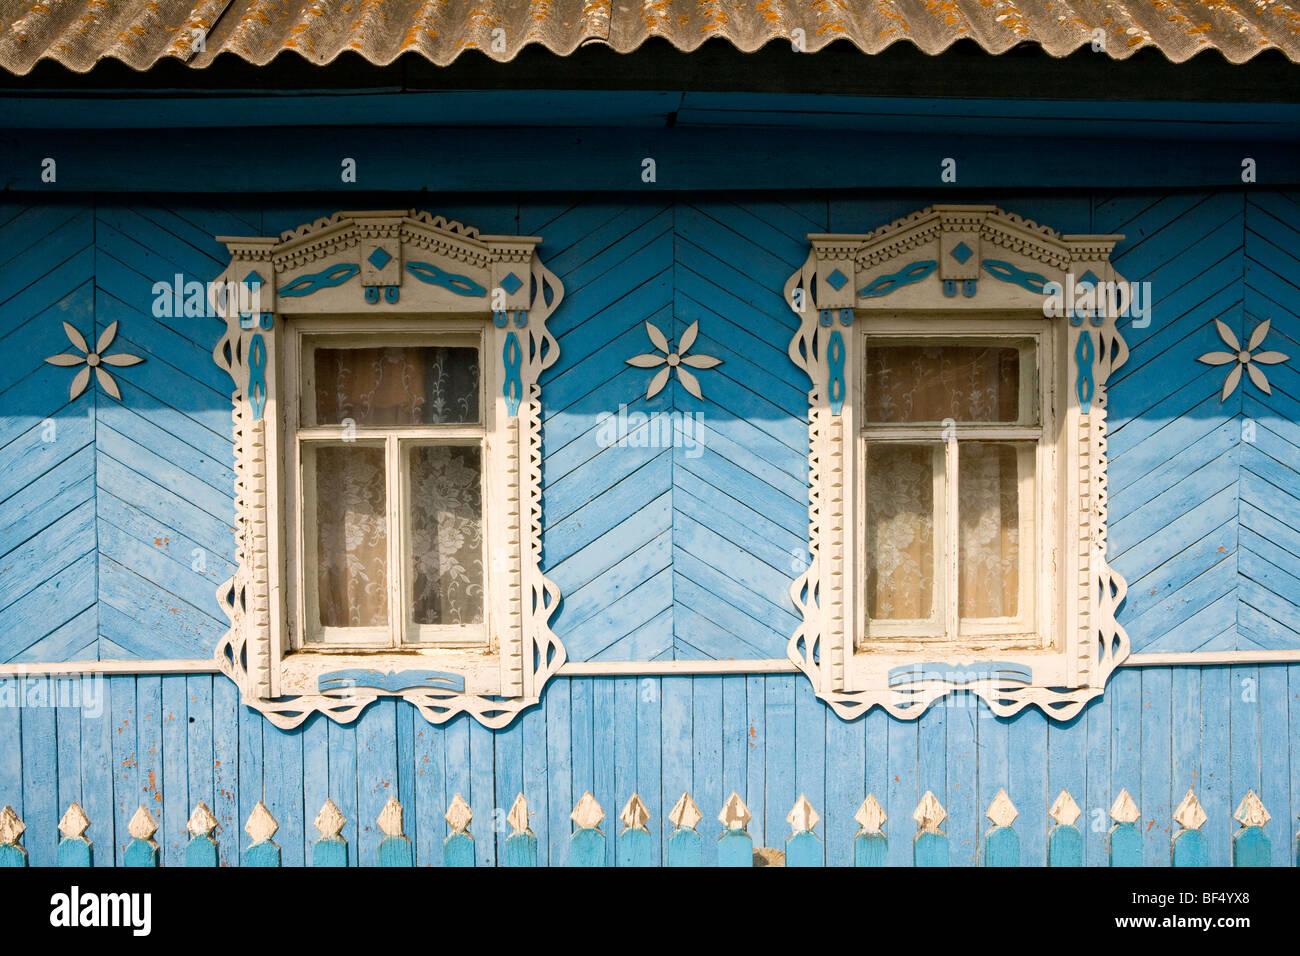 Ornate Window Frames Stockfotos & Ornate Window Frames Bilder - Alamy